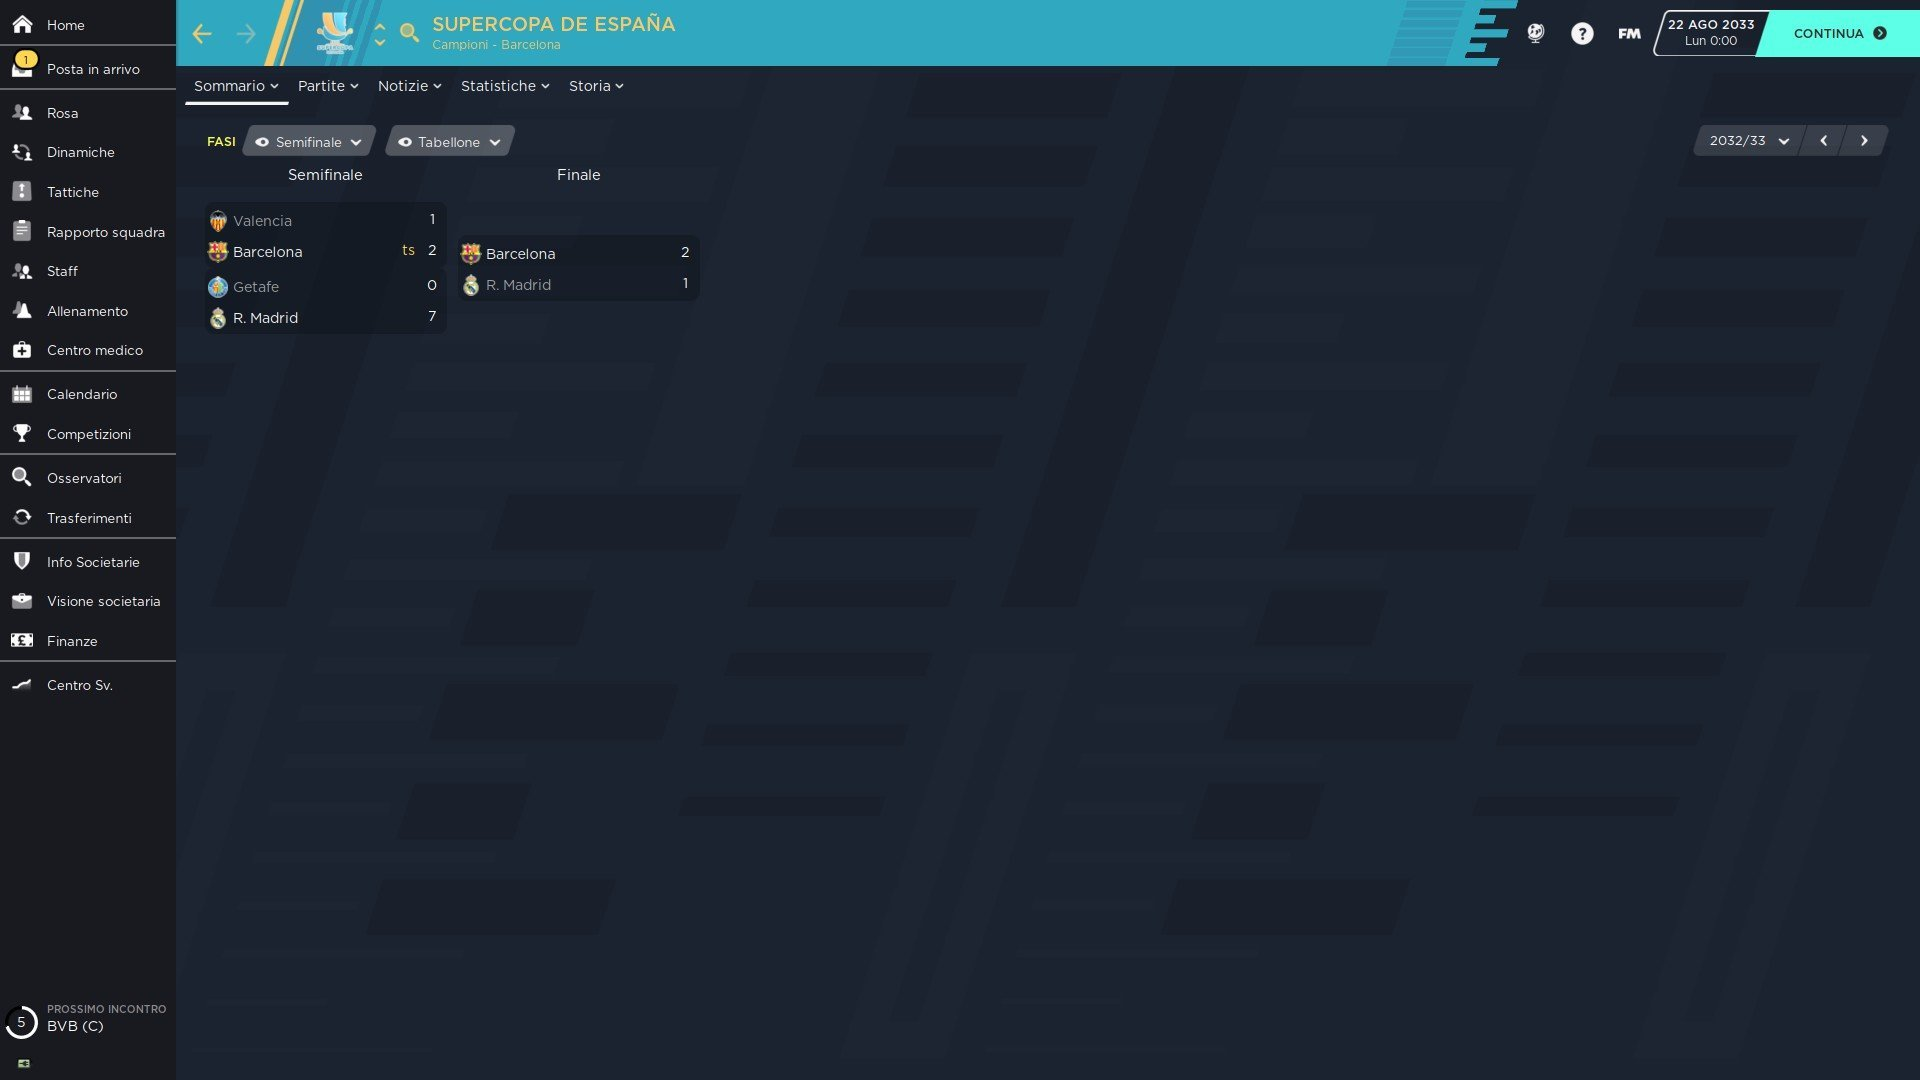 2 Supercoppa 2033